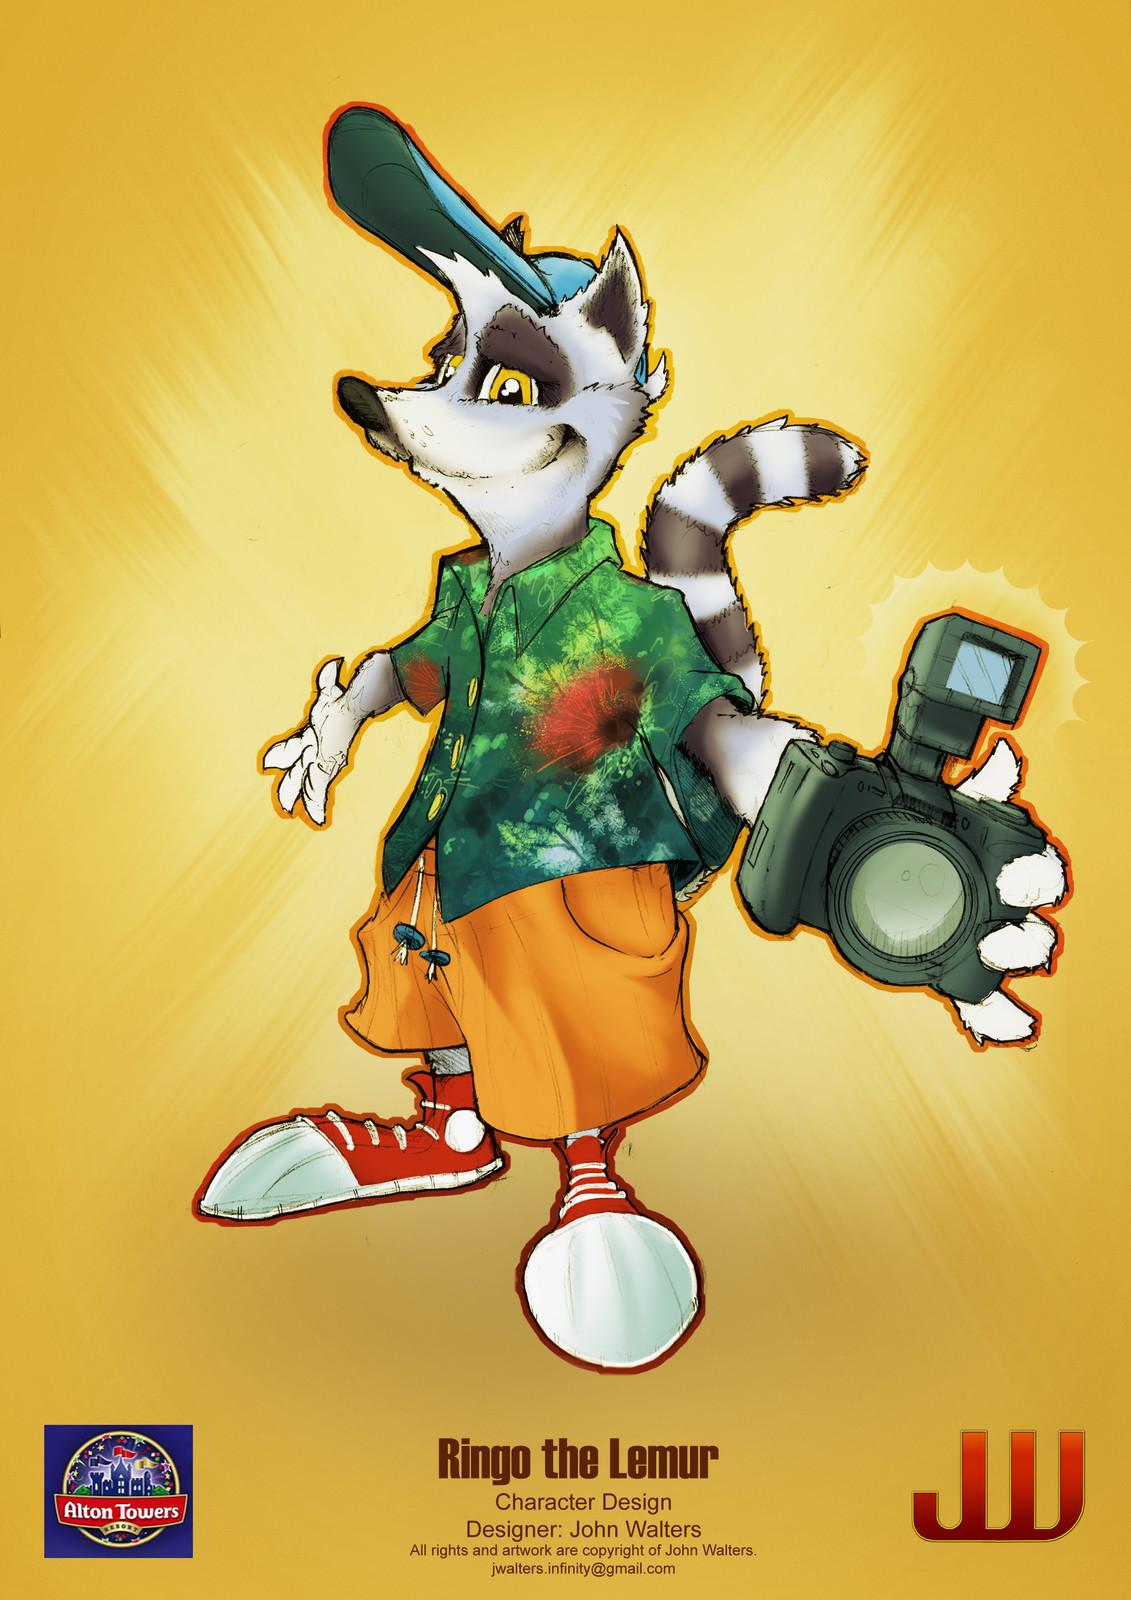 Ringo the Lemur - Character Design